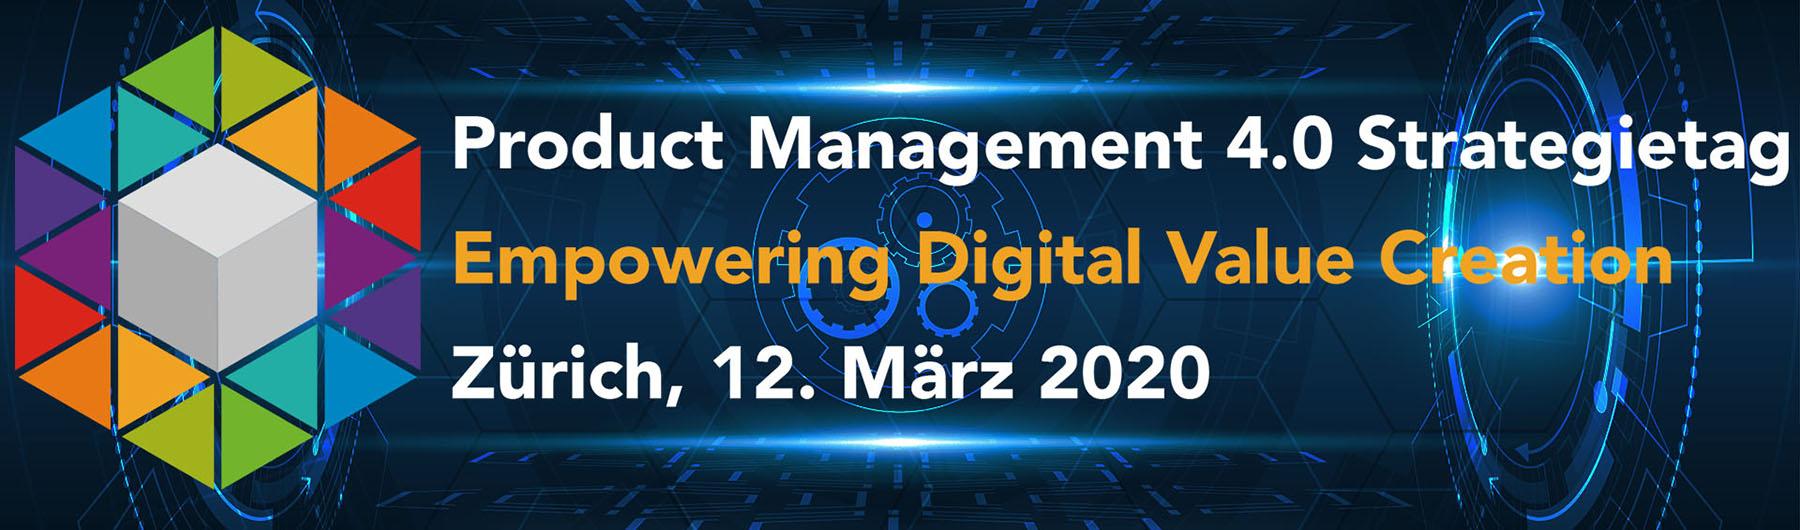 Product Management 4.0 Strategietag 2020